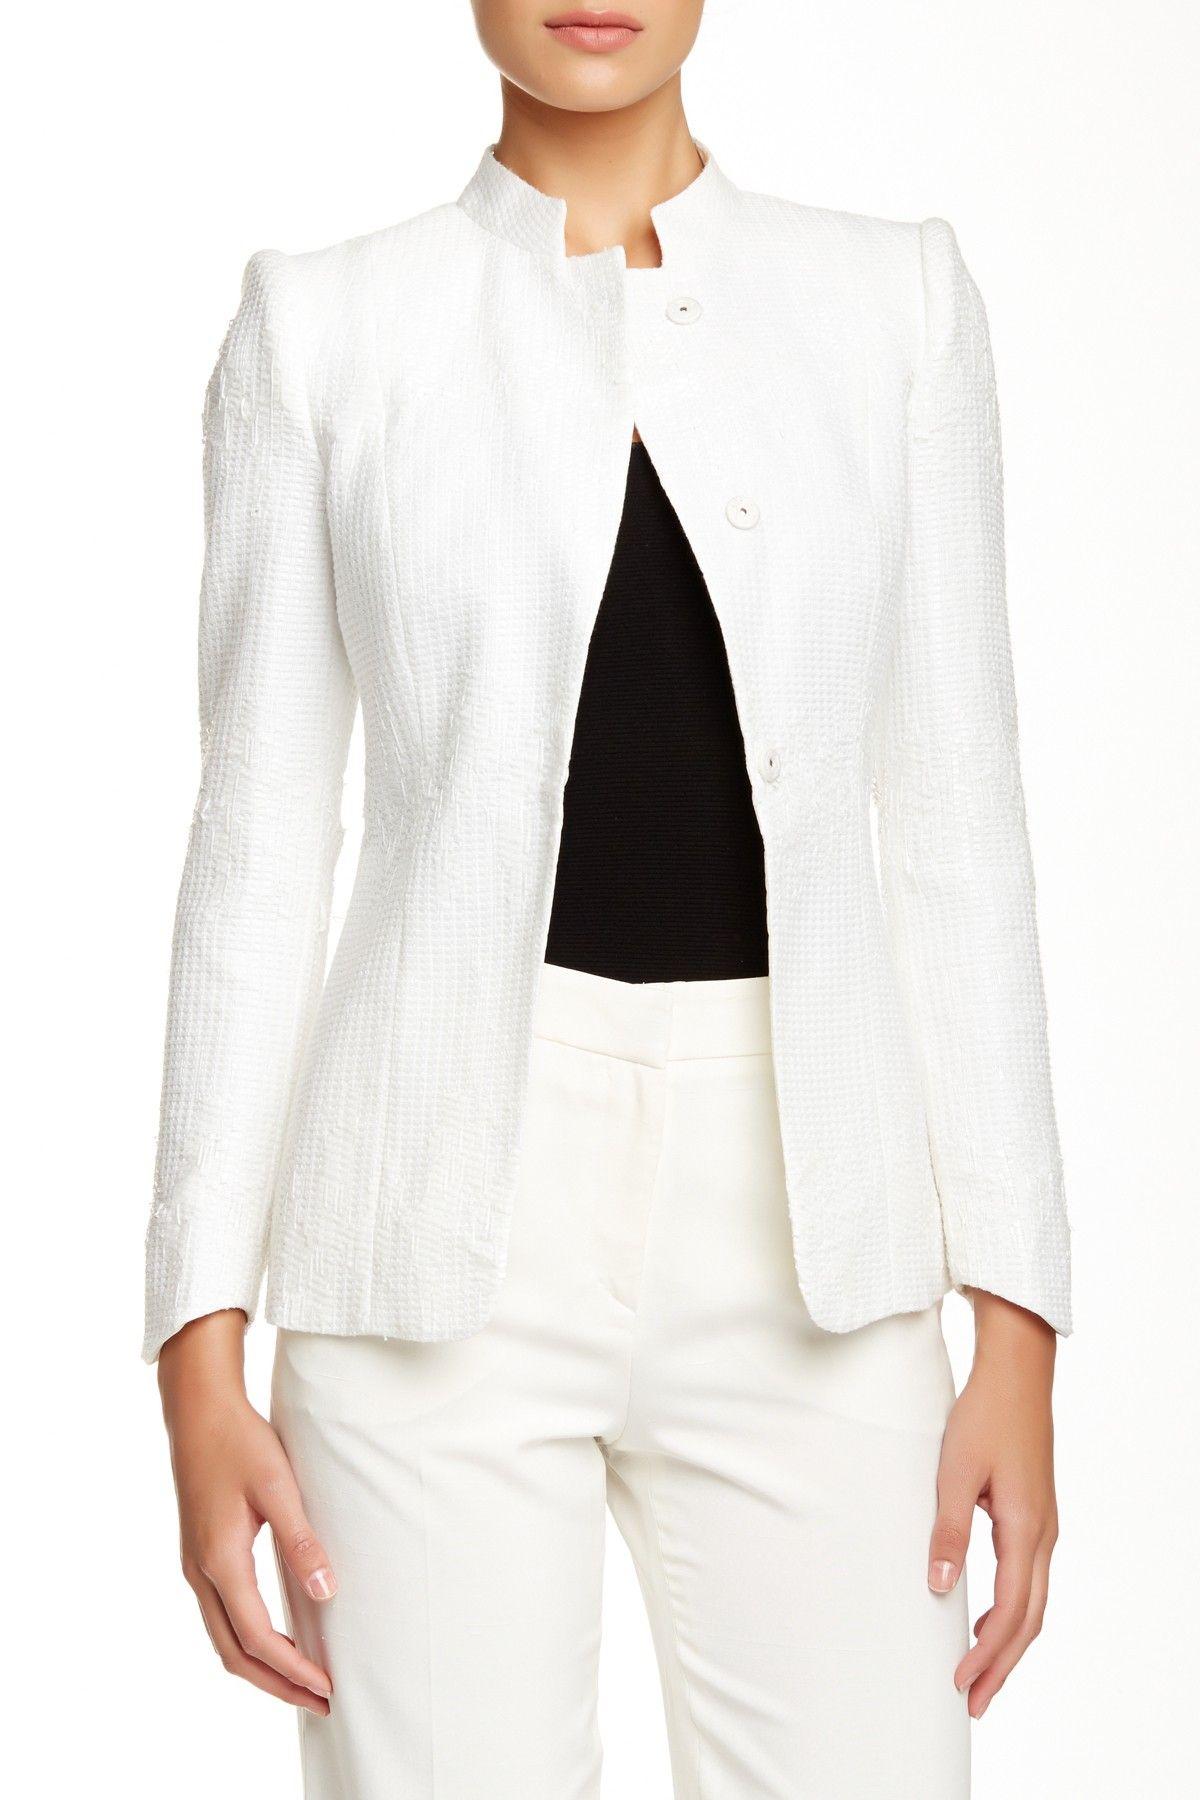 Chic Giorgio Armani Textured Single Breasted Jacket